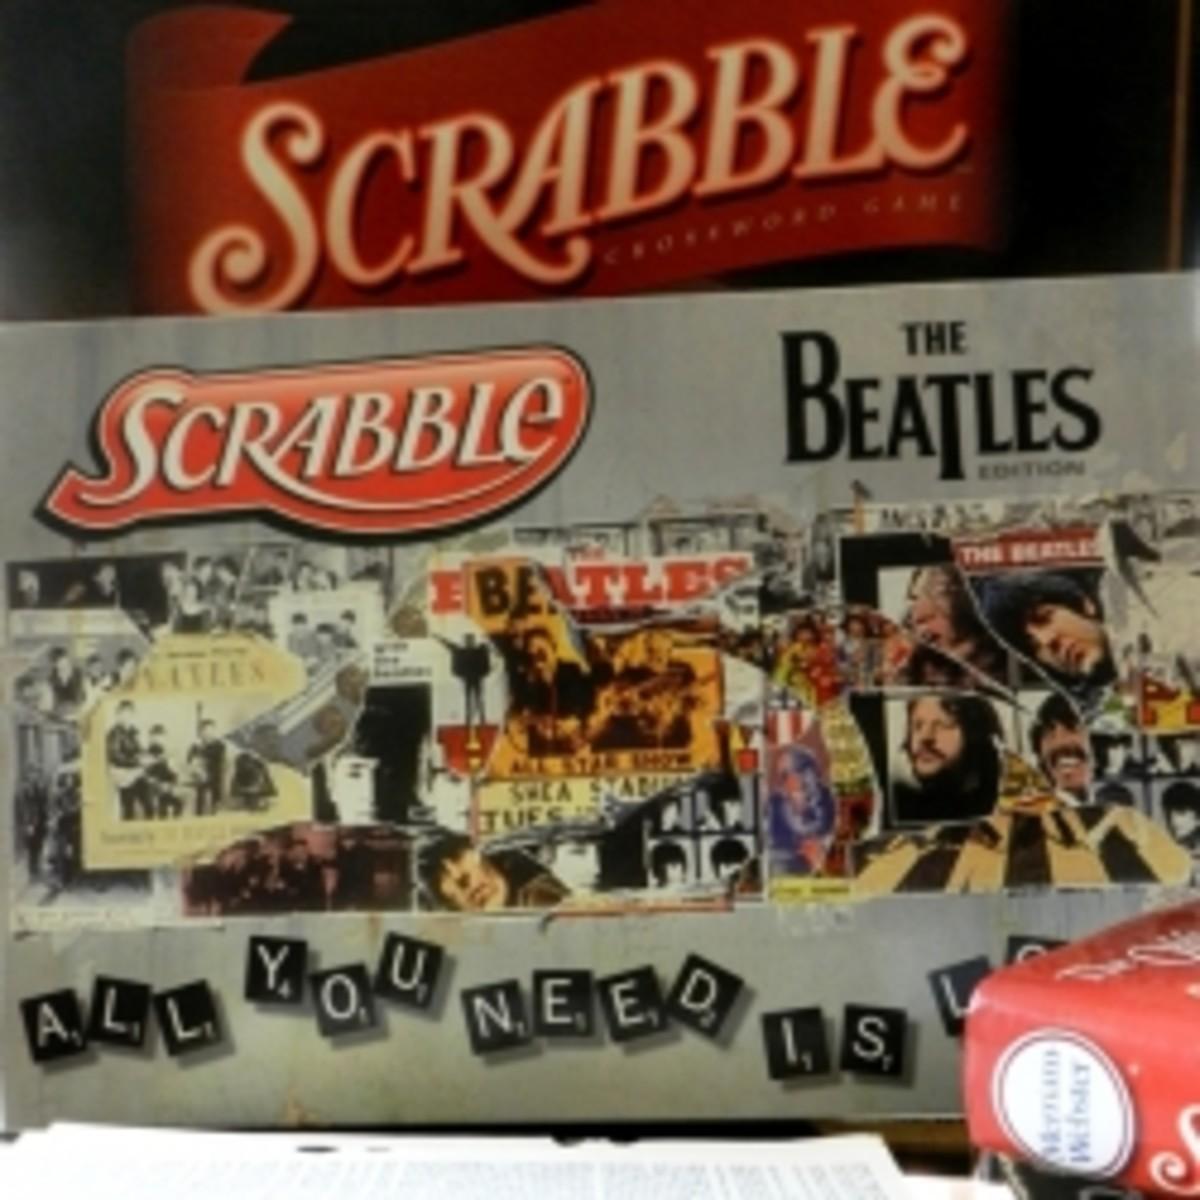 Beatles Edition Scrabble Game